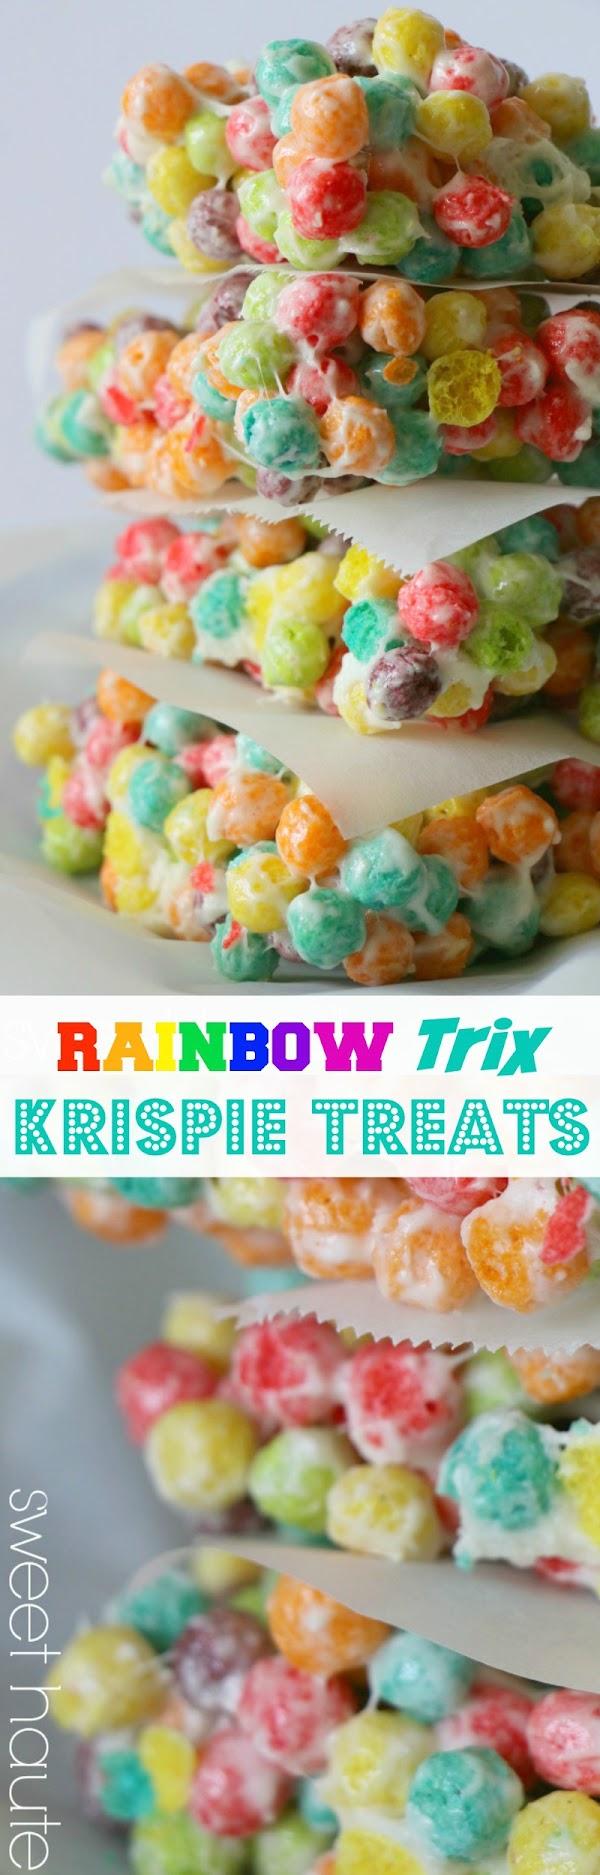 http://sweethaute.blogspot.com/2015/03/rainbow-trix-krispie-treats.html